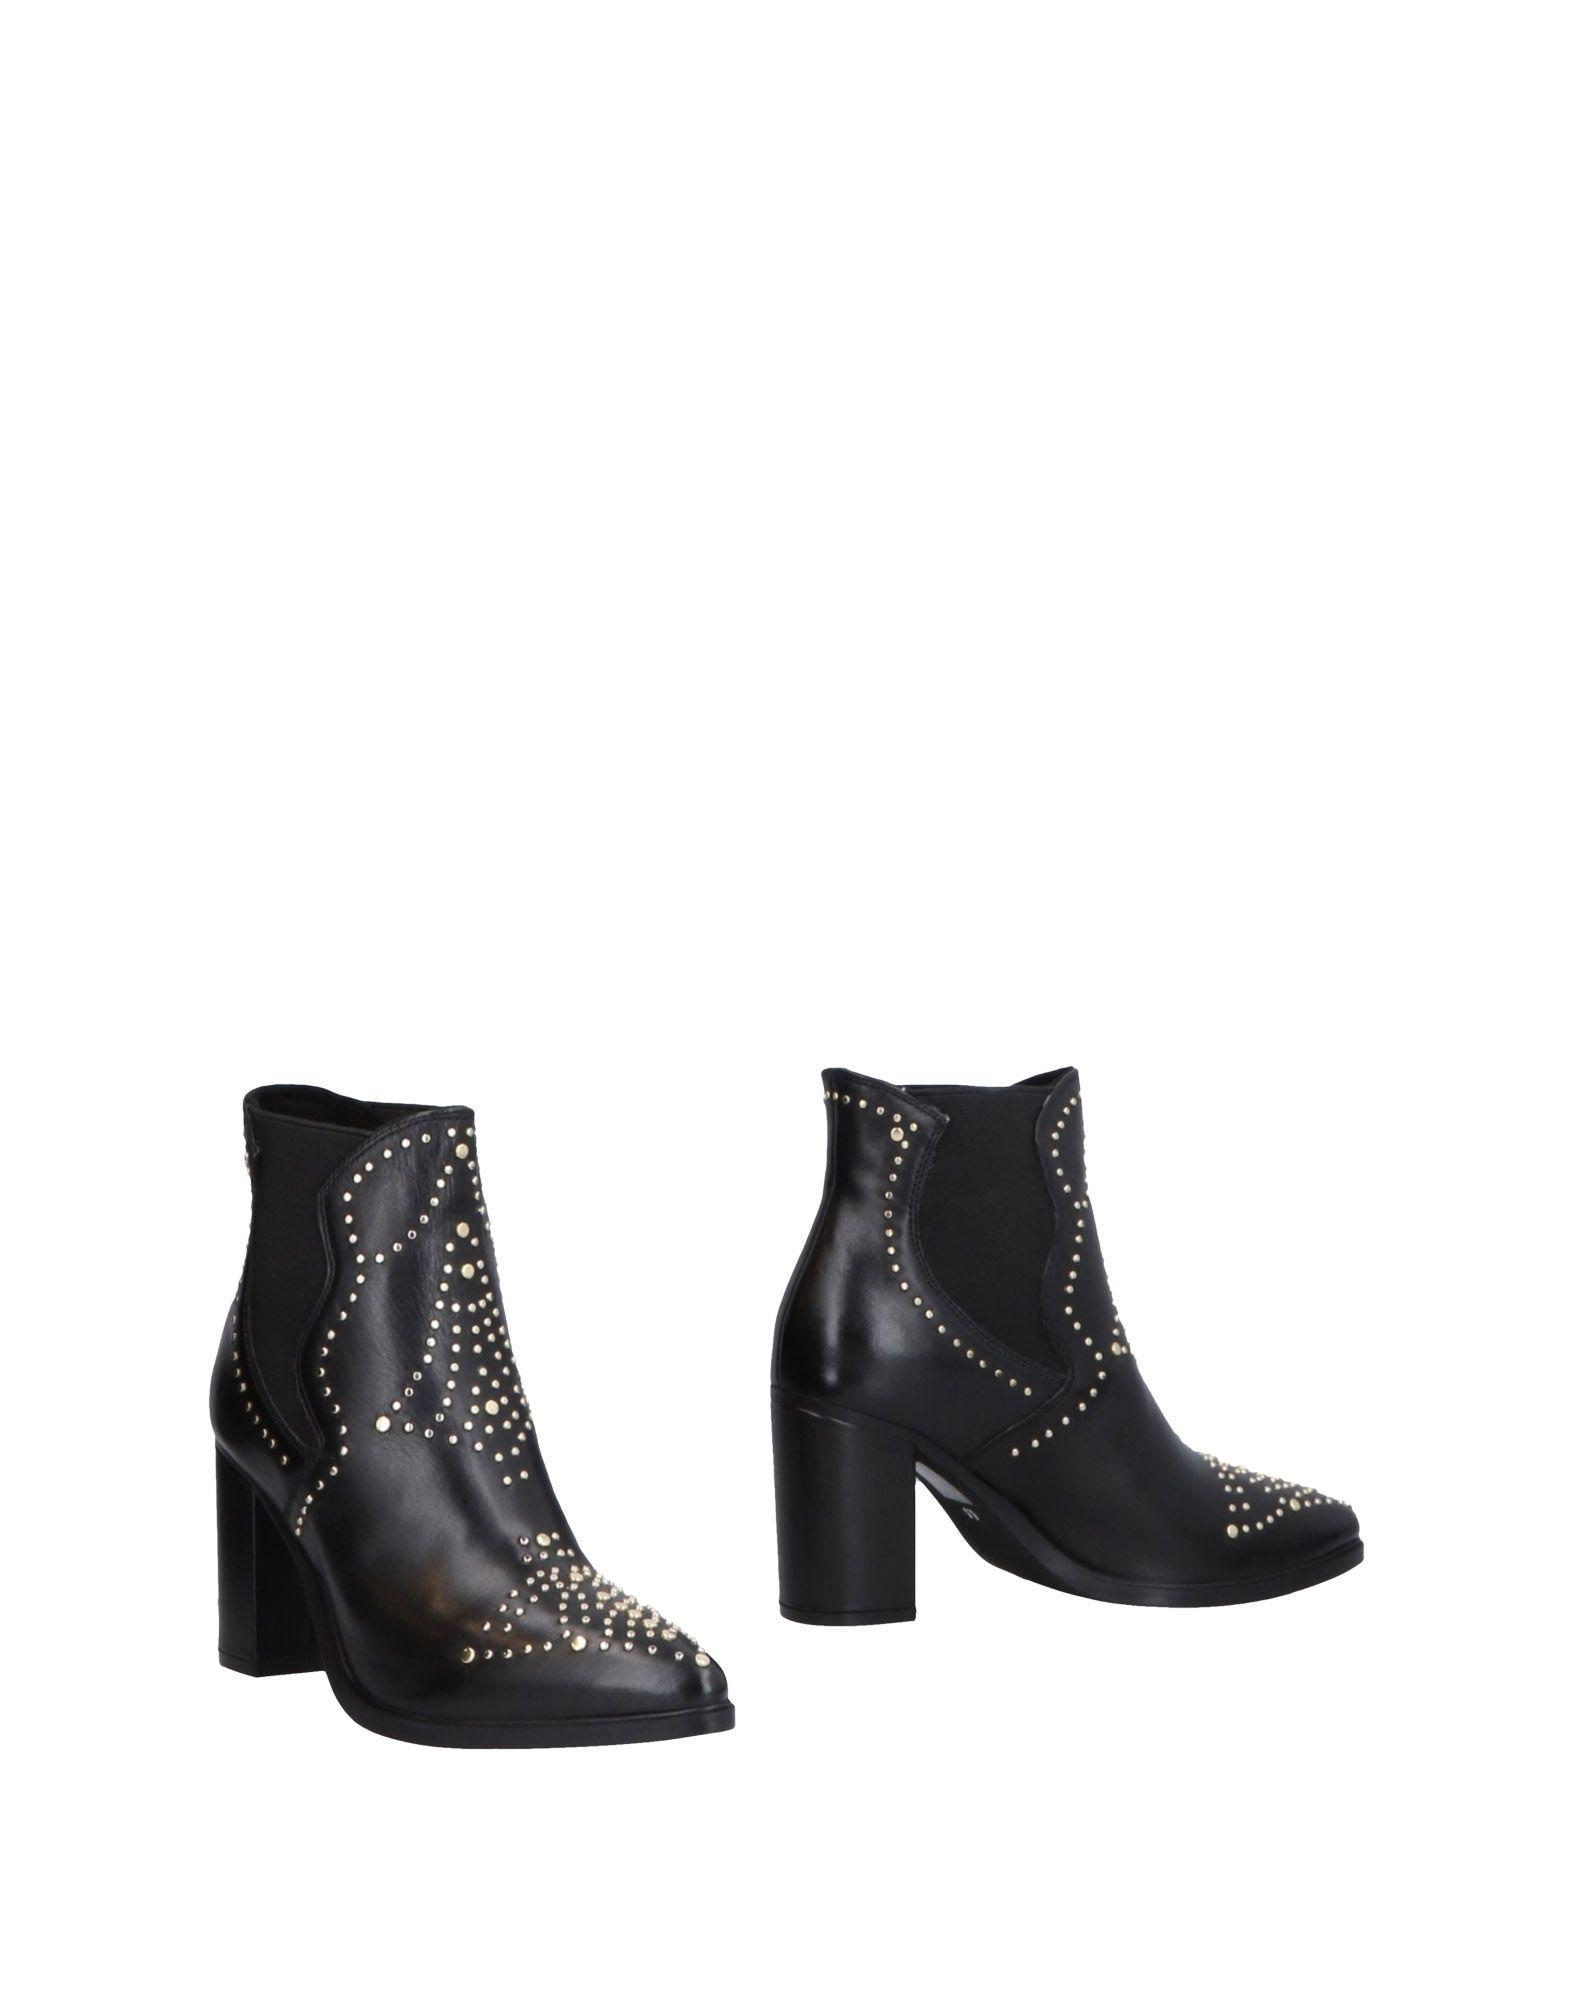 Stilvolle billige Schuhe Damen Steve Madden Chelsea Boots Damen Schuhe  11465480VE 8591b6